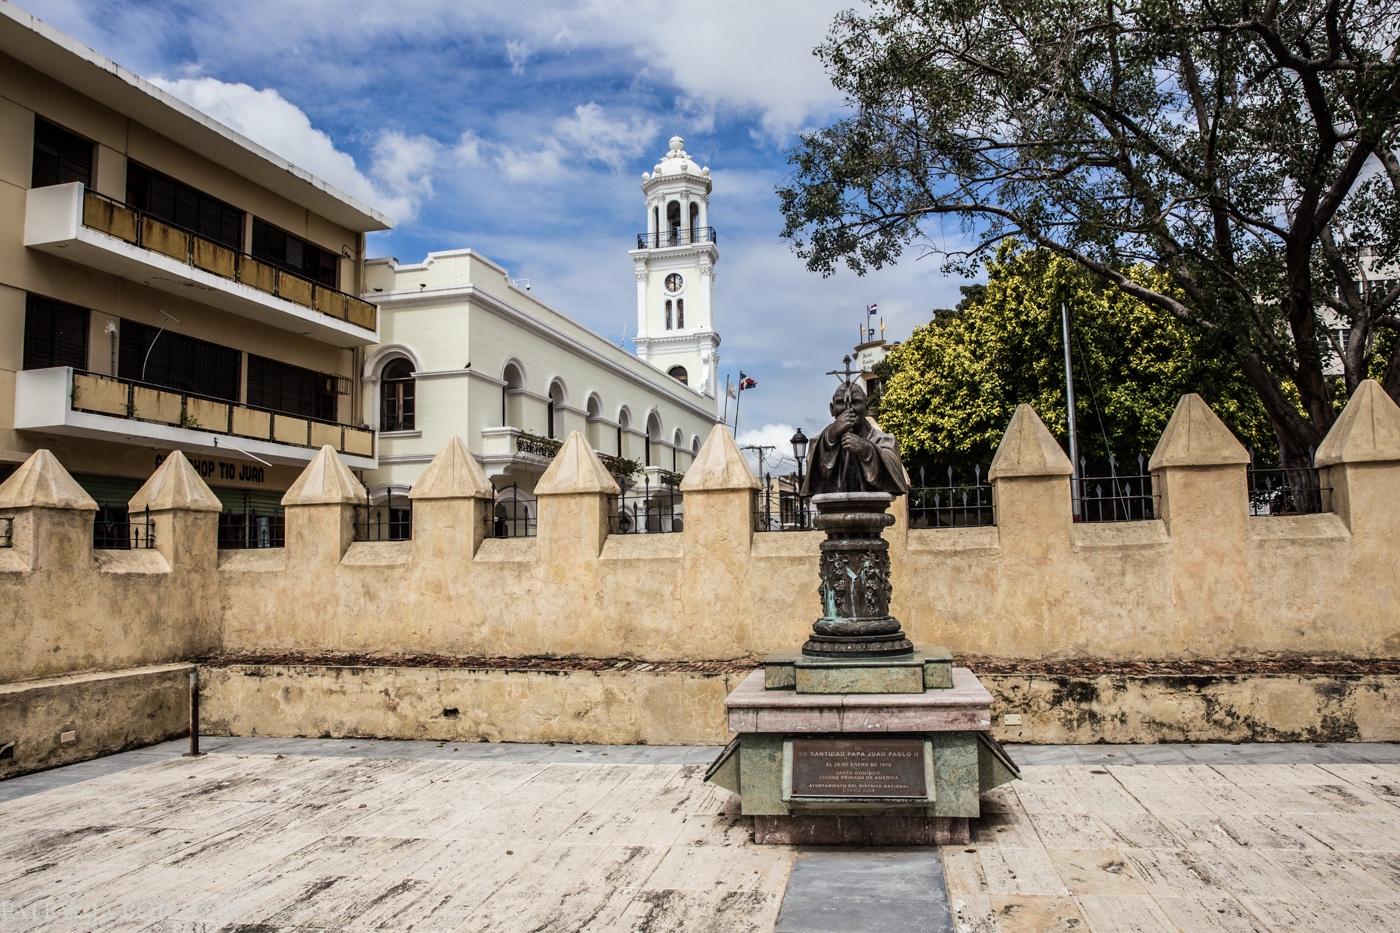 Patrycja-Borzecka-Photo-Santo-Domingo-Zona-Colonial-13